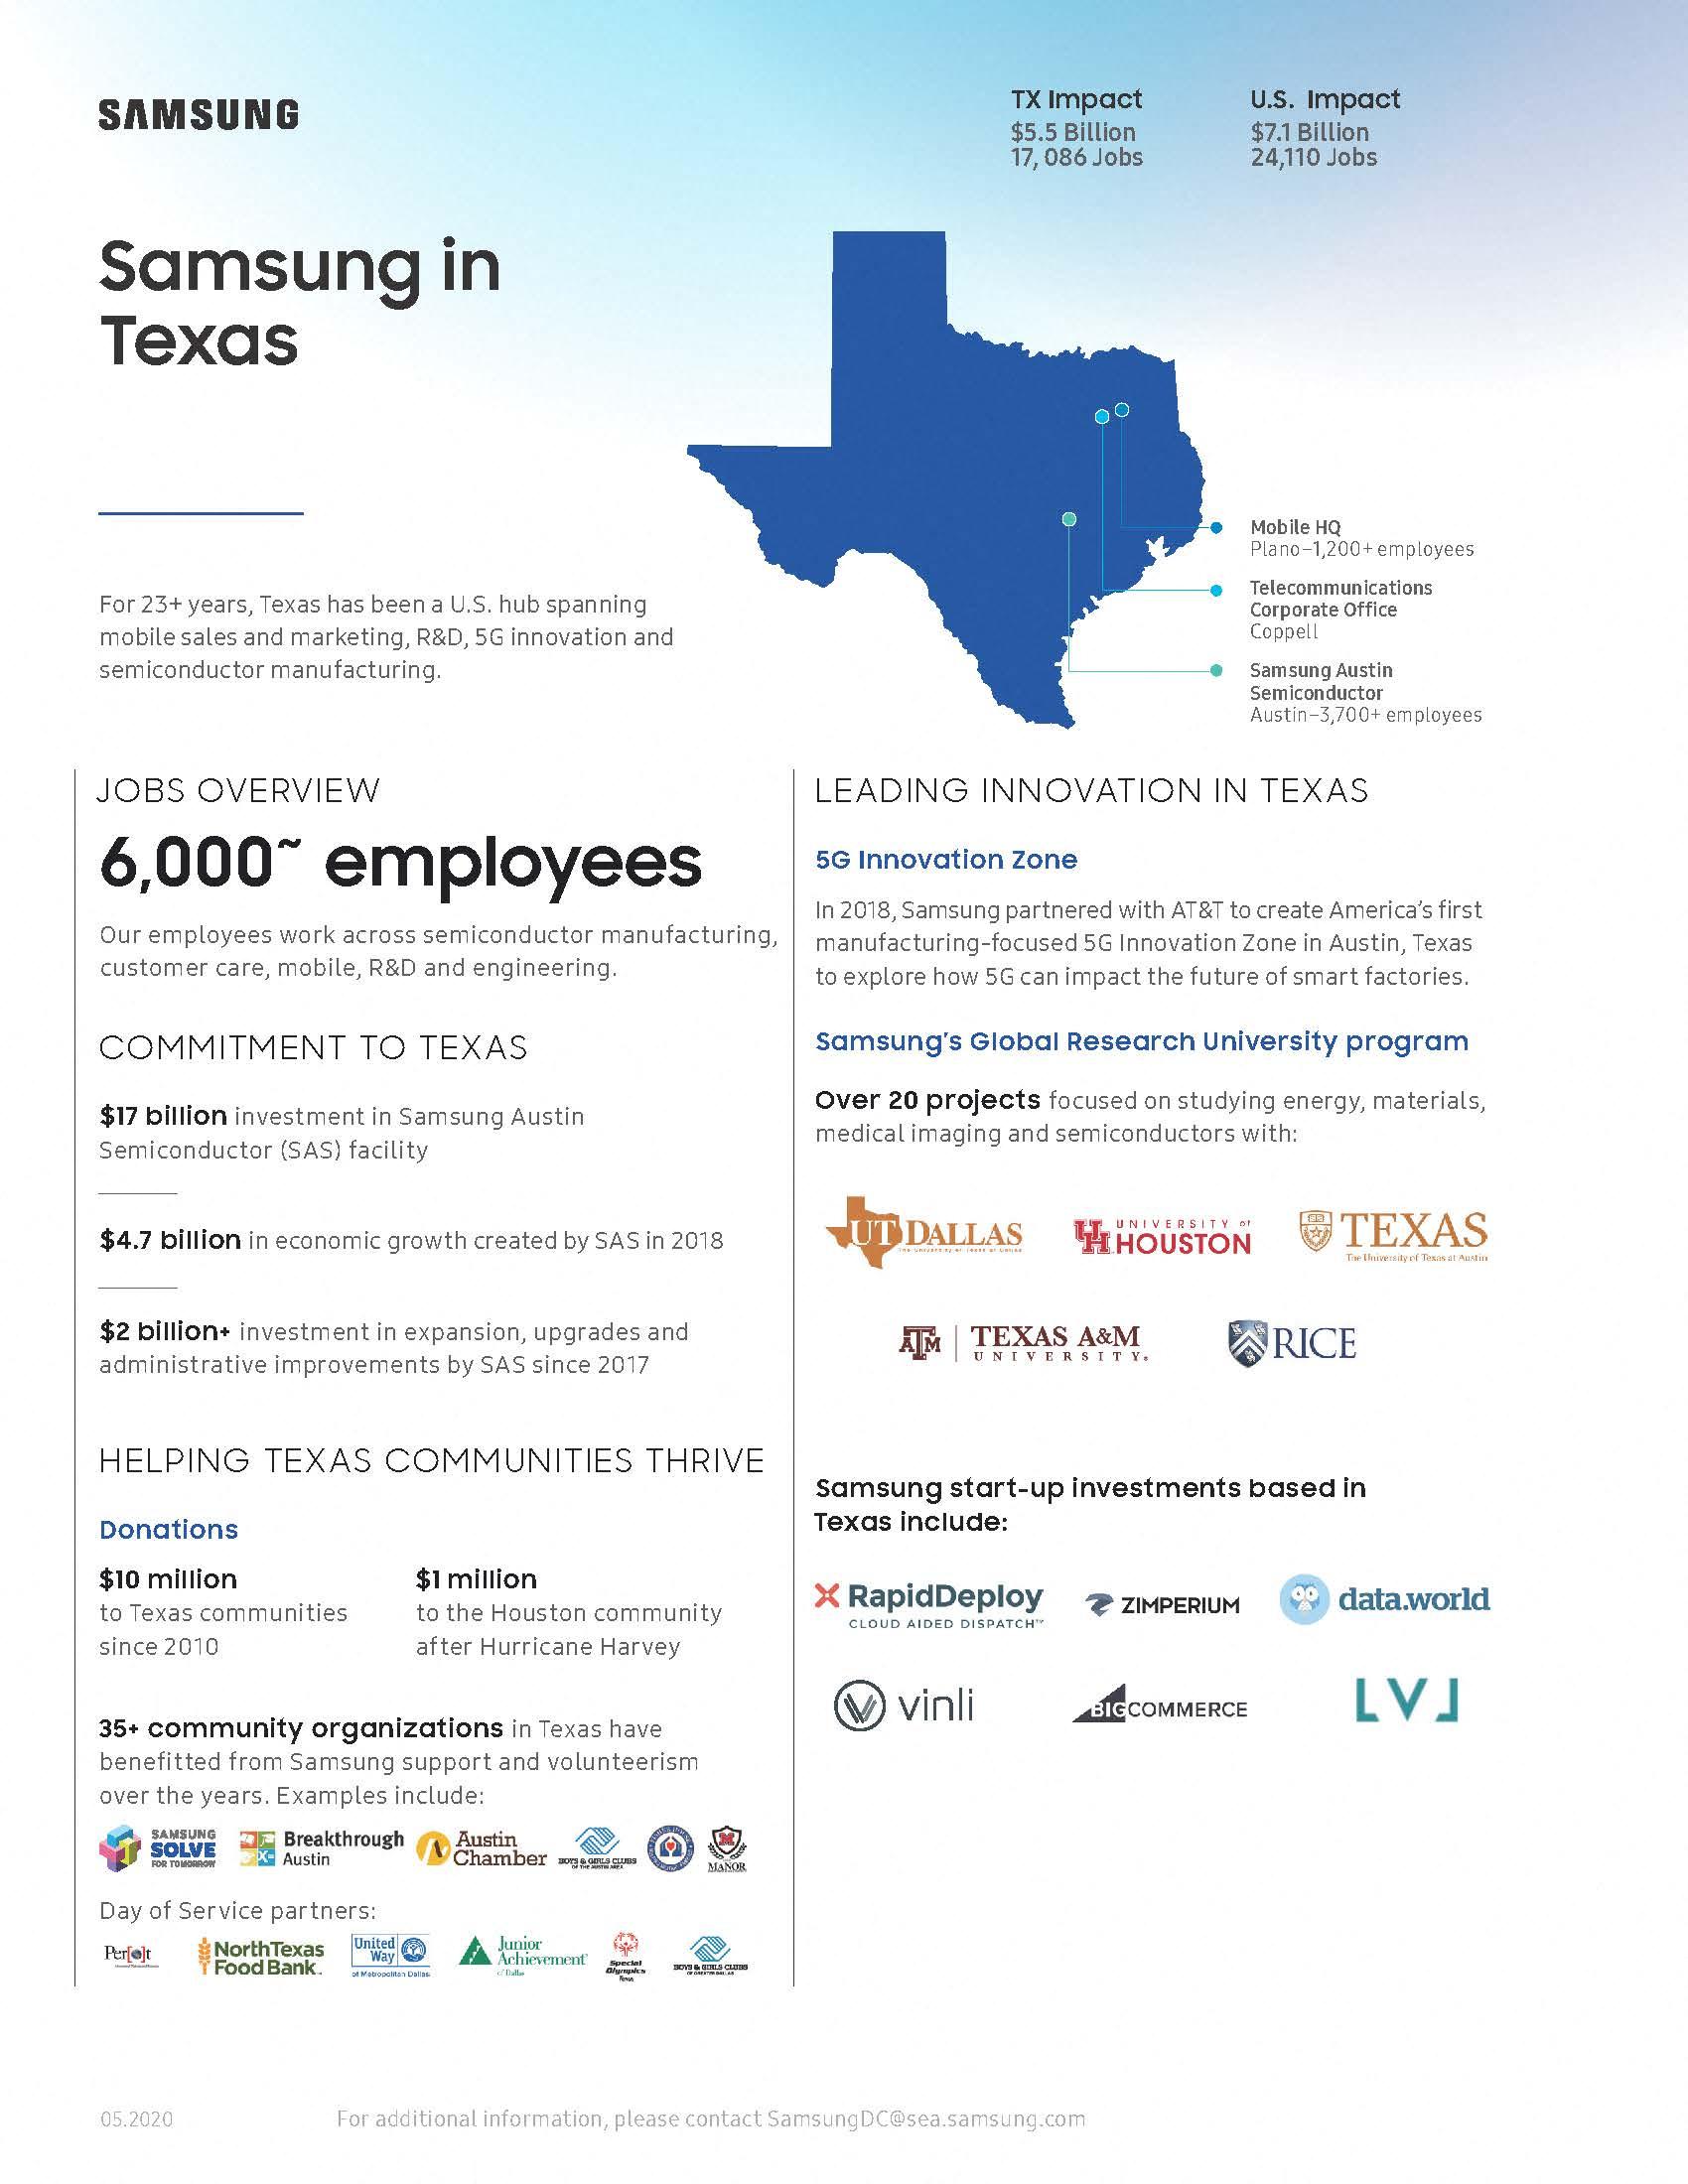 Samsung in Texas 2020